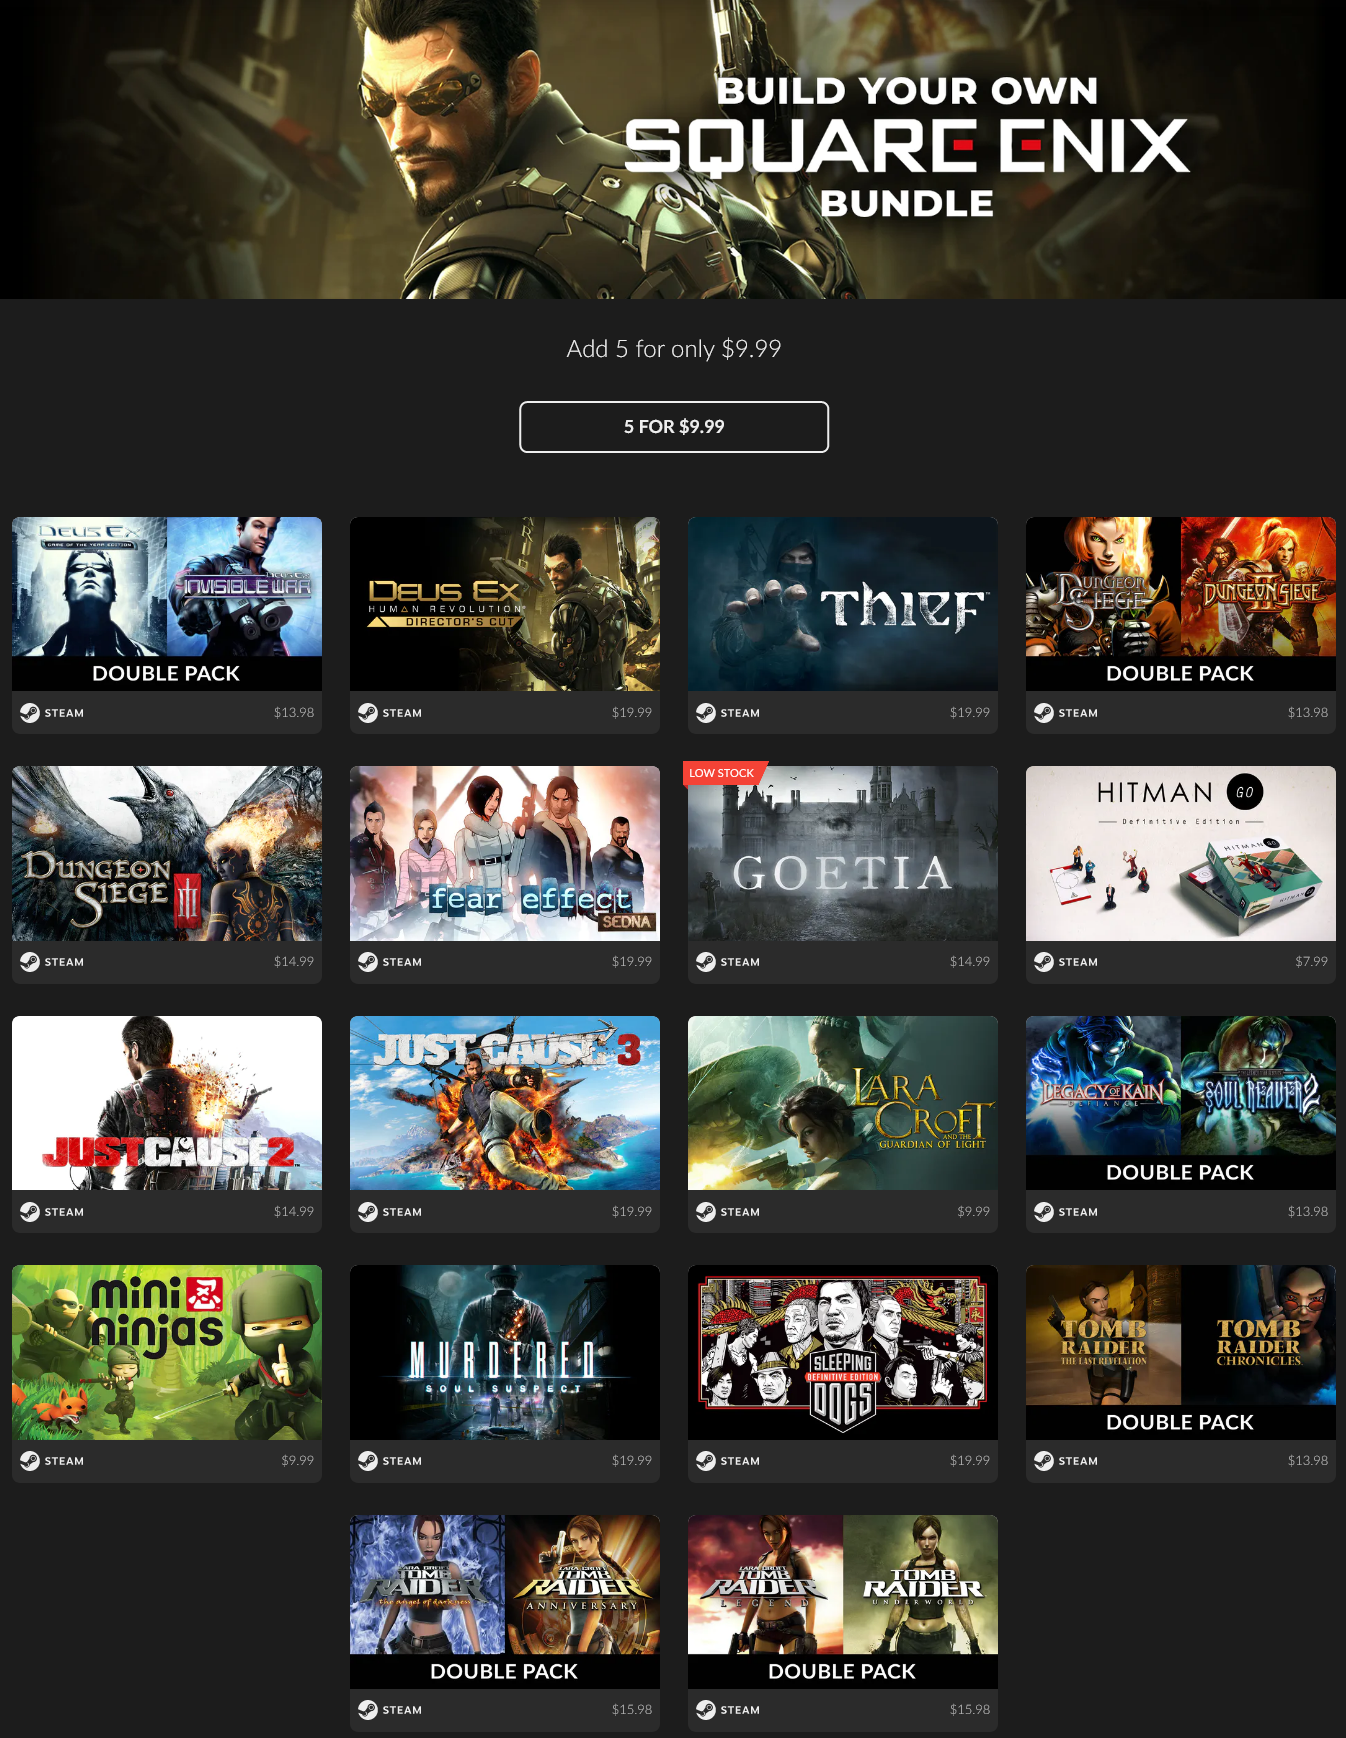 Screenshot 2021-09-25 at 00-06-49 Build your own Square Enix Bundle Fanatical.png